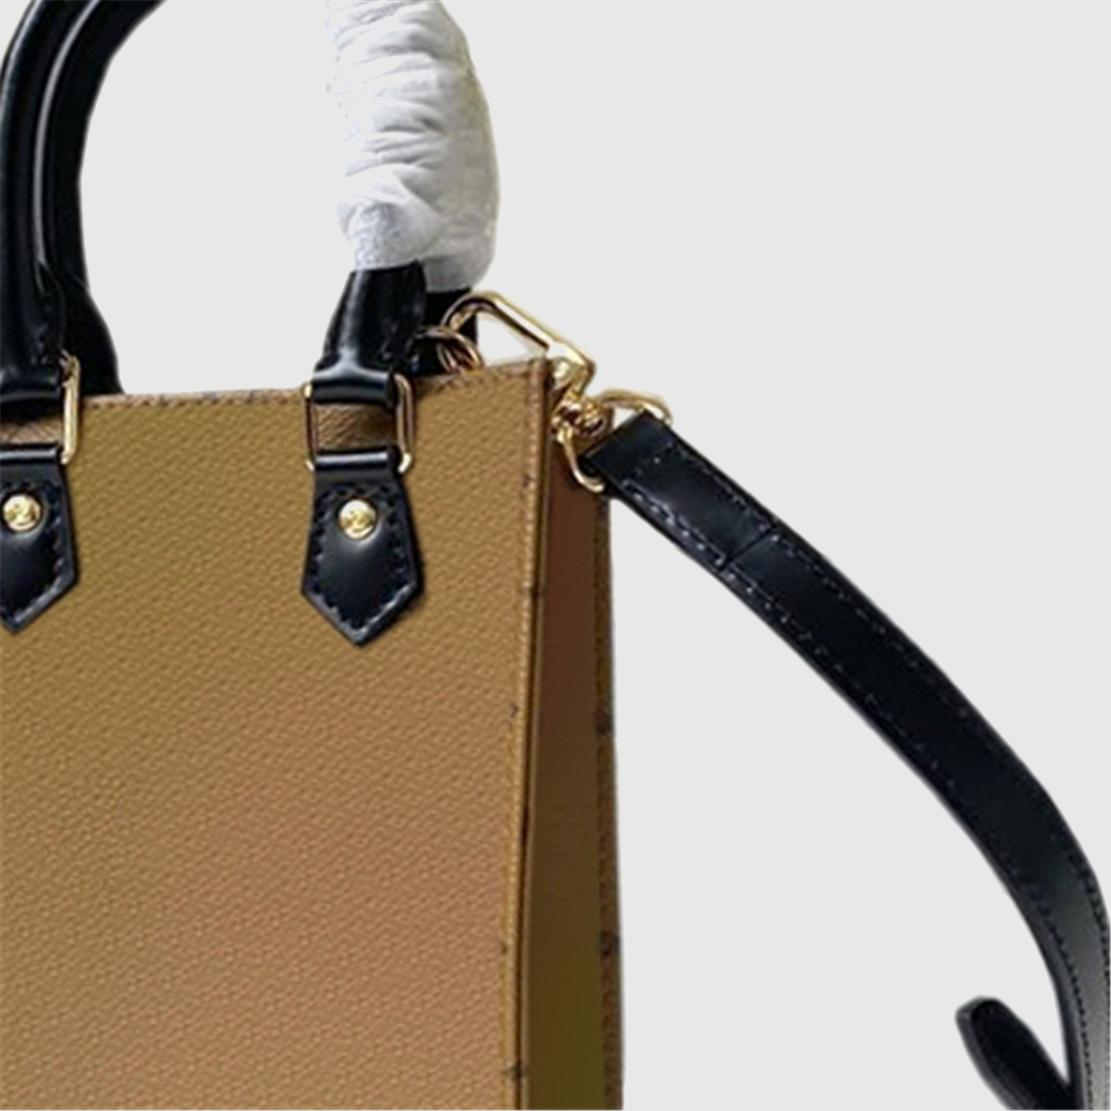 Bolsos de hombro del bolso de totalizadores de los bolsos para mujer de las mujeres del bolso del totalizador del bolso de Crossbody monederos bolsos de cuero embrague Mochila cartera de la moda 25-47 Fannypack